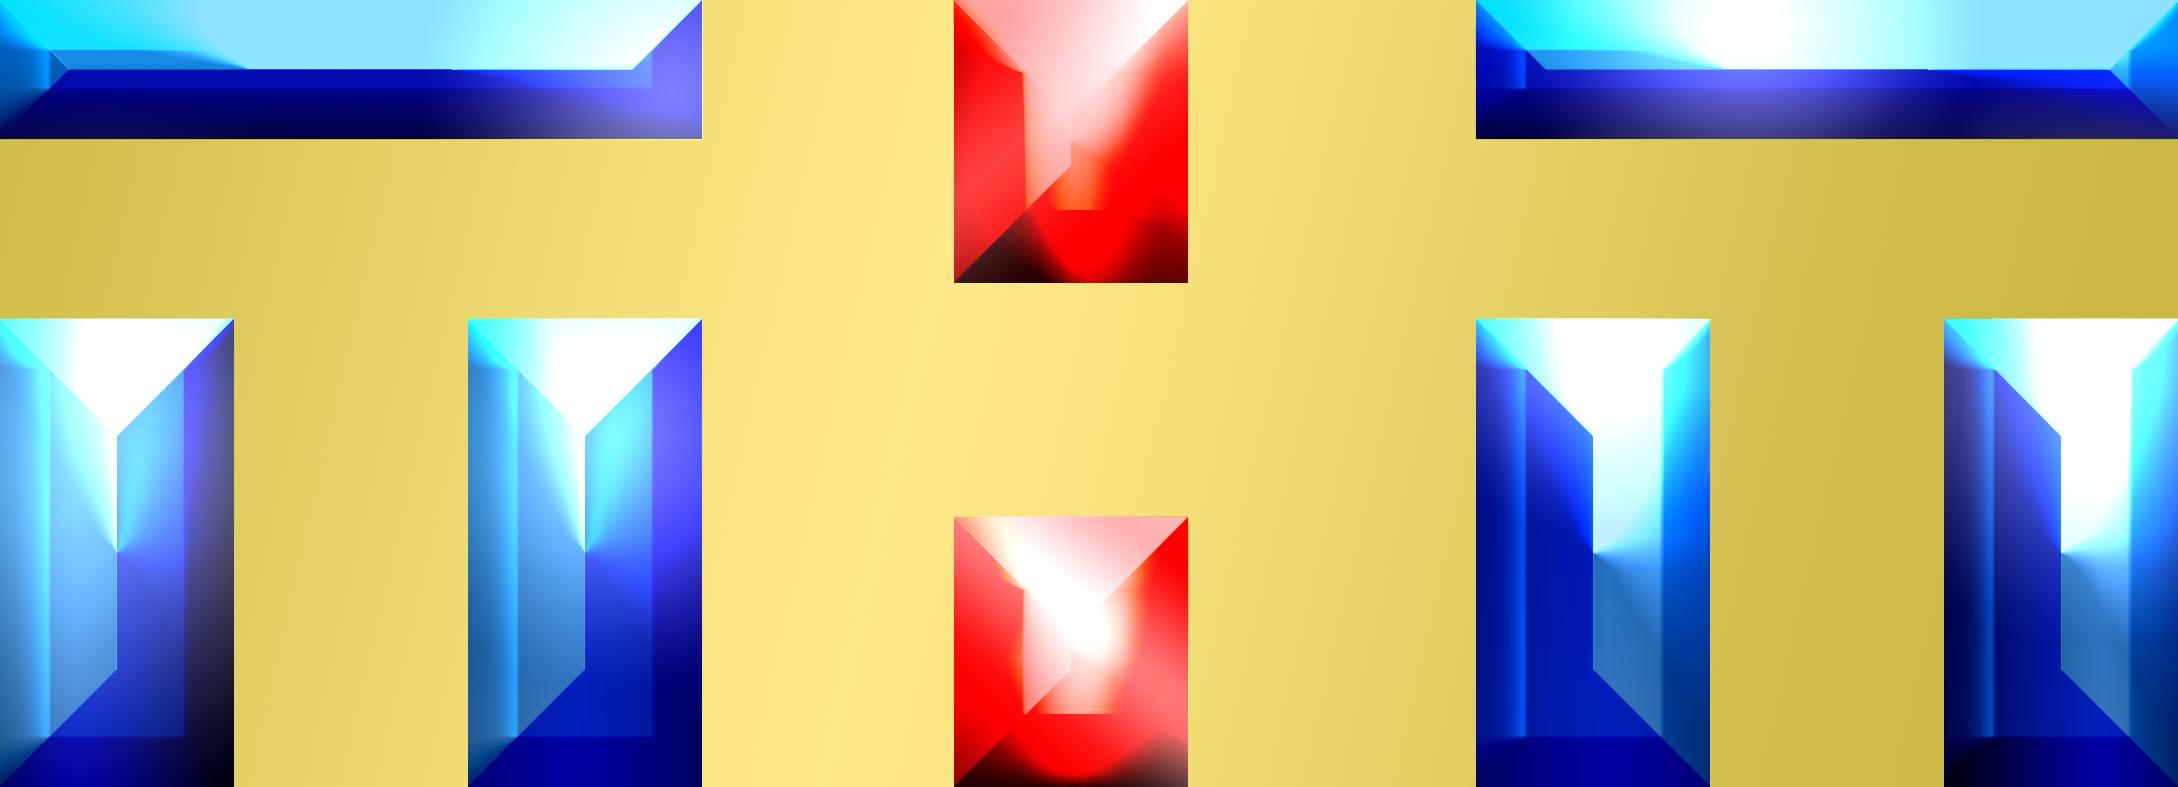 ТНТ (с января 2010 до февраля 2010)